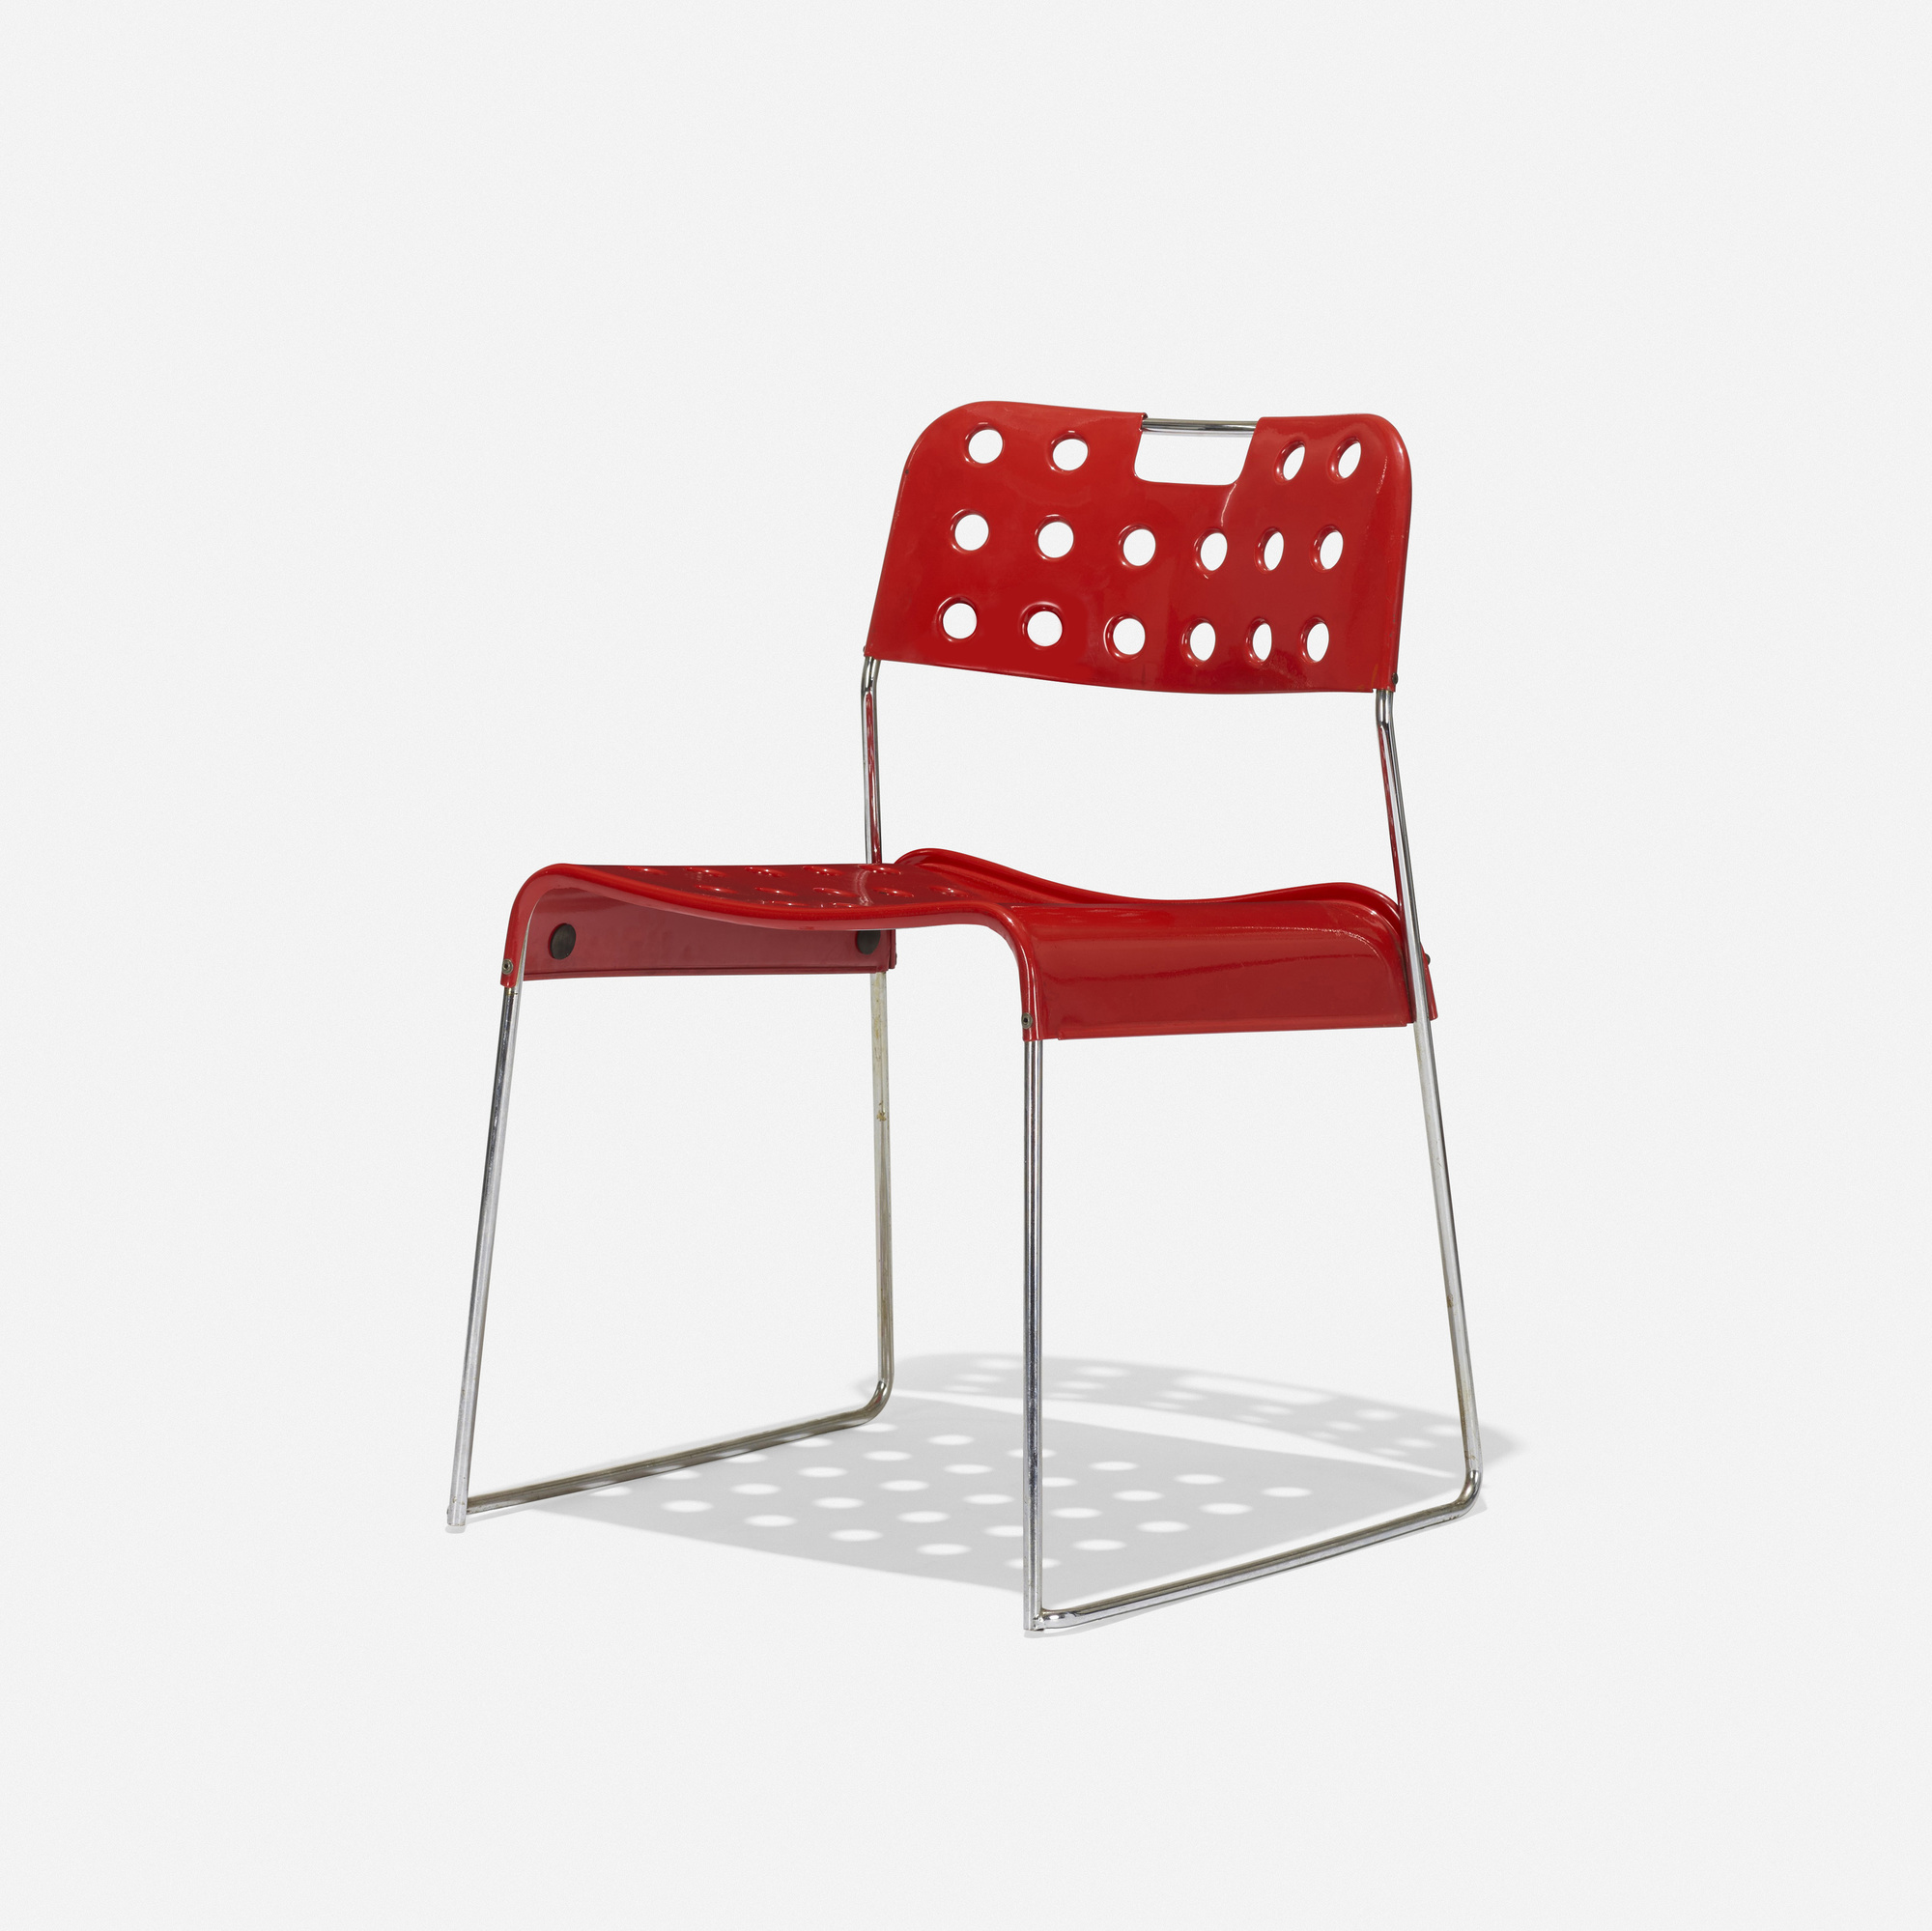 408: Rodney Kinsmen / Omkstack chair (2 of 3)